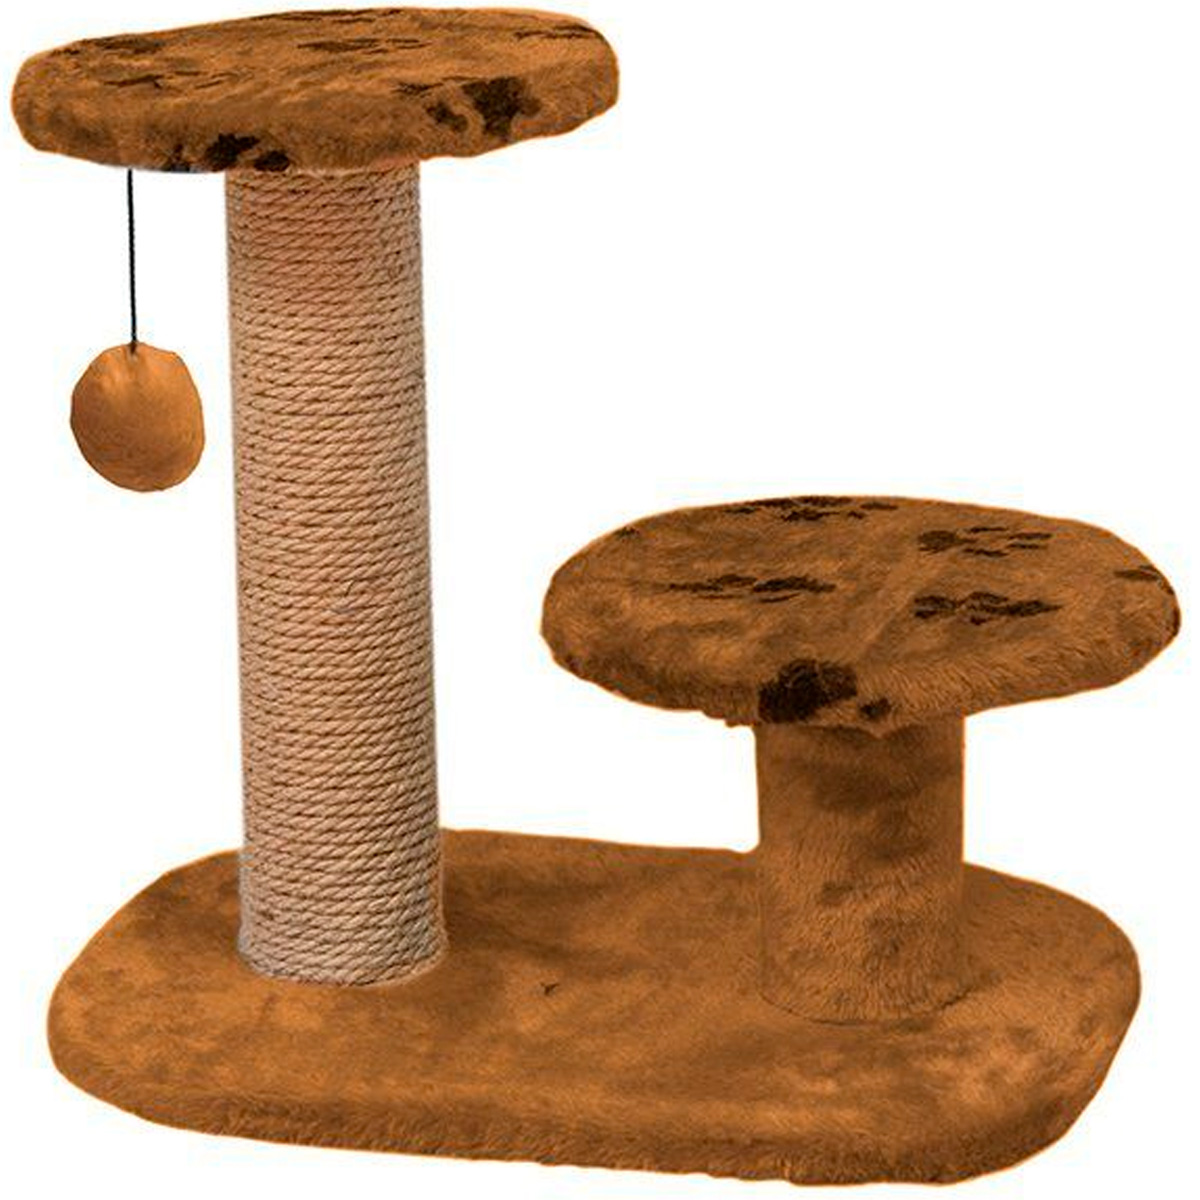 Когтеточка Дарэлл 95 круглая с двумя полками коричневая 56 х 36 х 52 см (1 шт) когтеточка дарэлл джут 95 круглая с 2 полками серая 56 х 36 х 52 см 1 шт